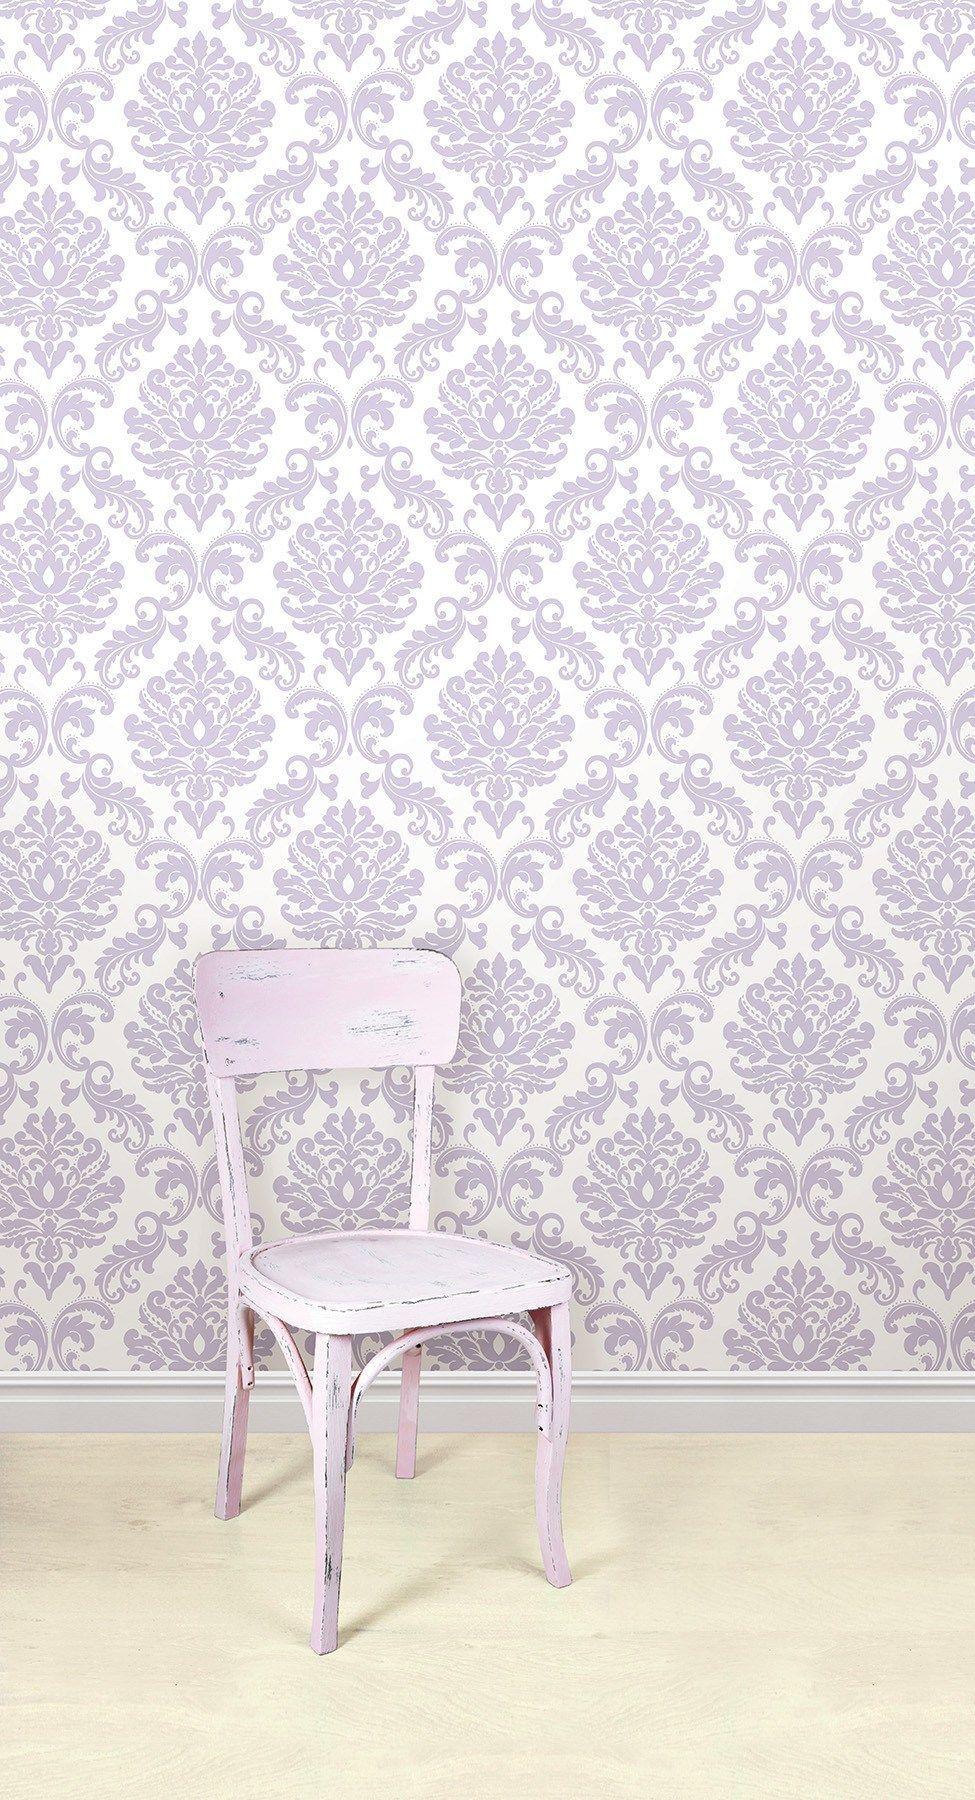 Purple Ariel Peel And Stick Wallpaper Nuwallpaper Peel And Stick Wallpaper Purple Bedding